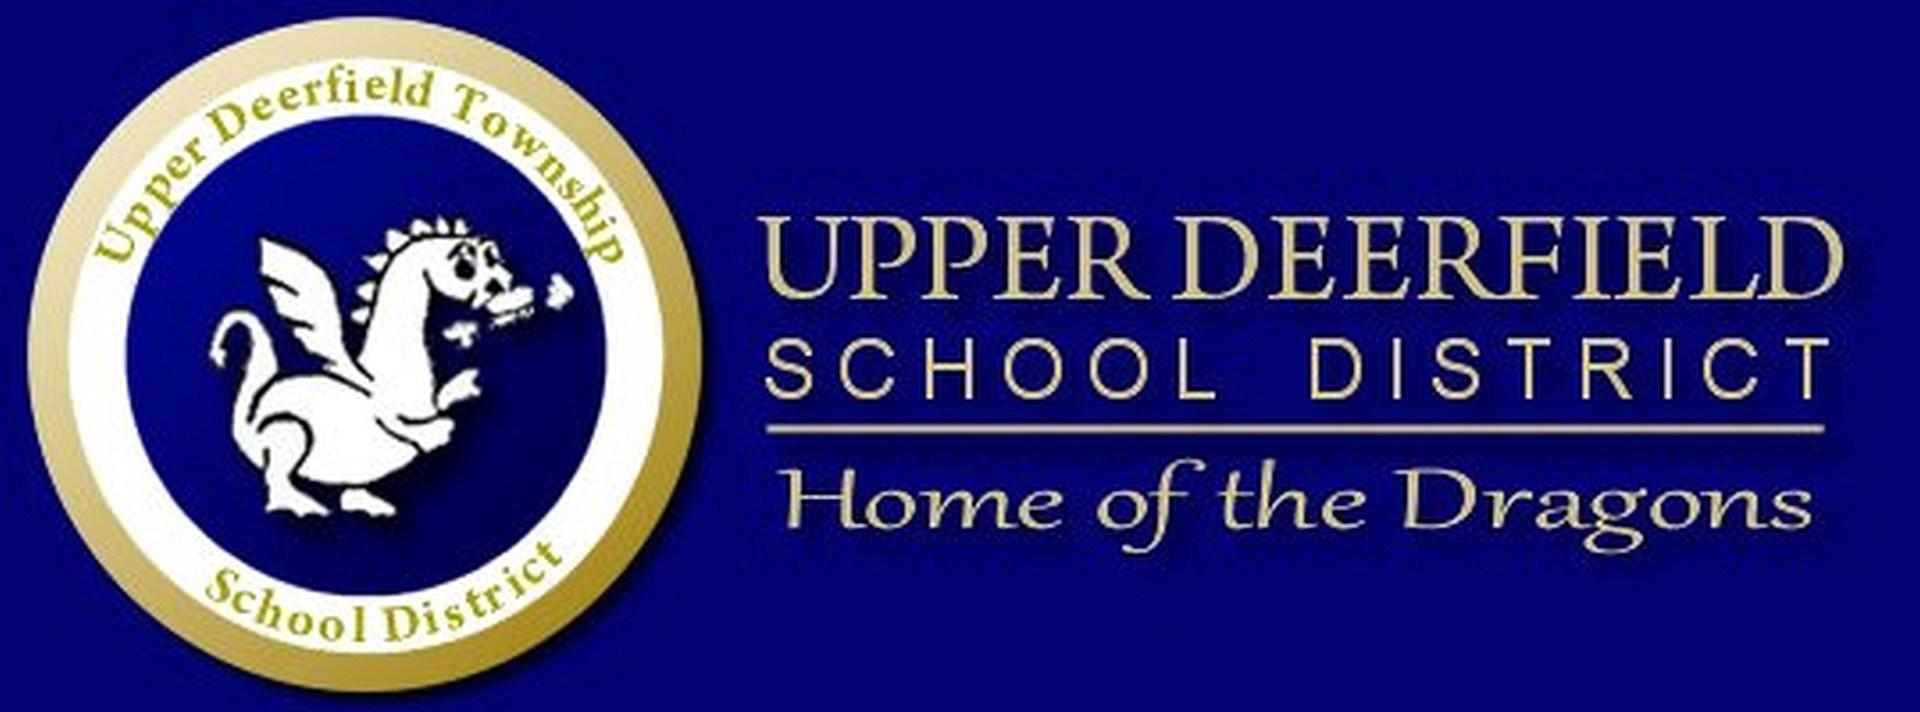 Upper Deerfield Township School District Logo